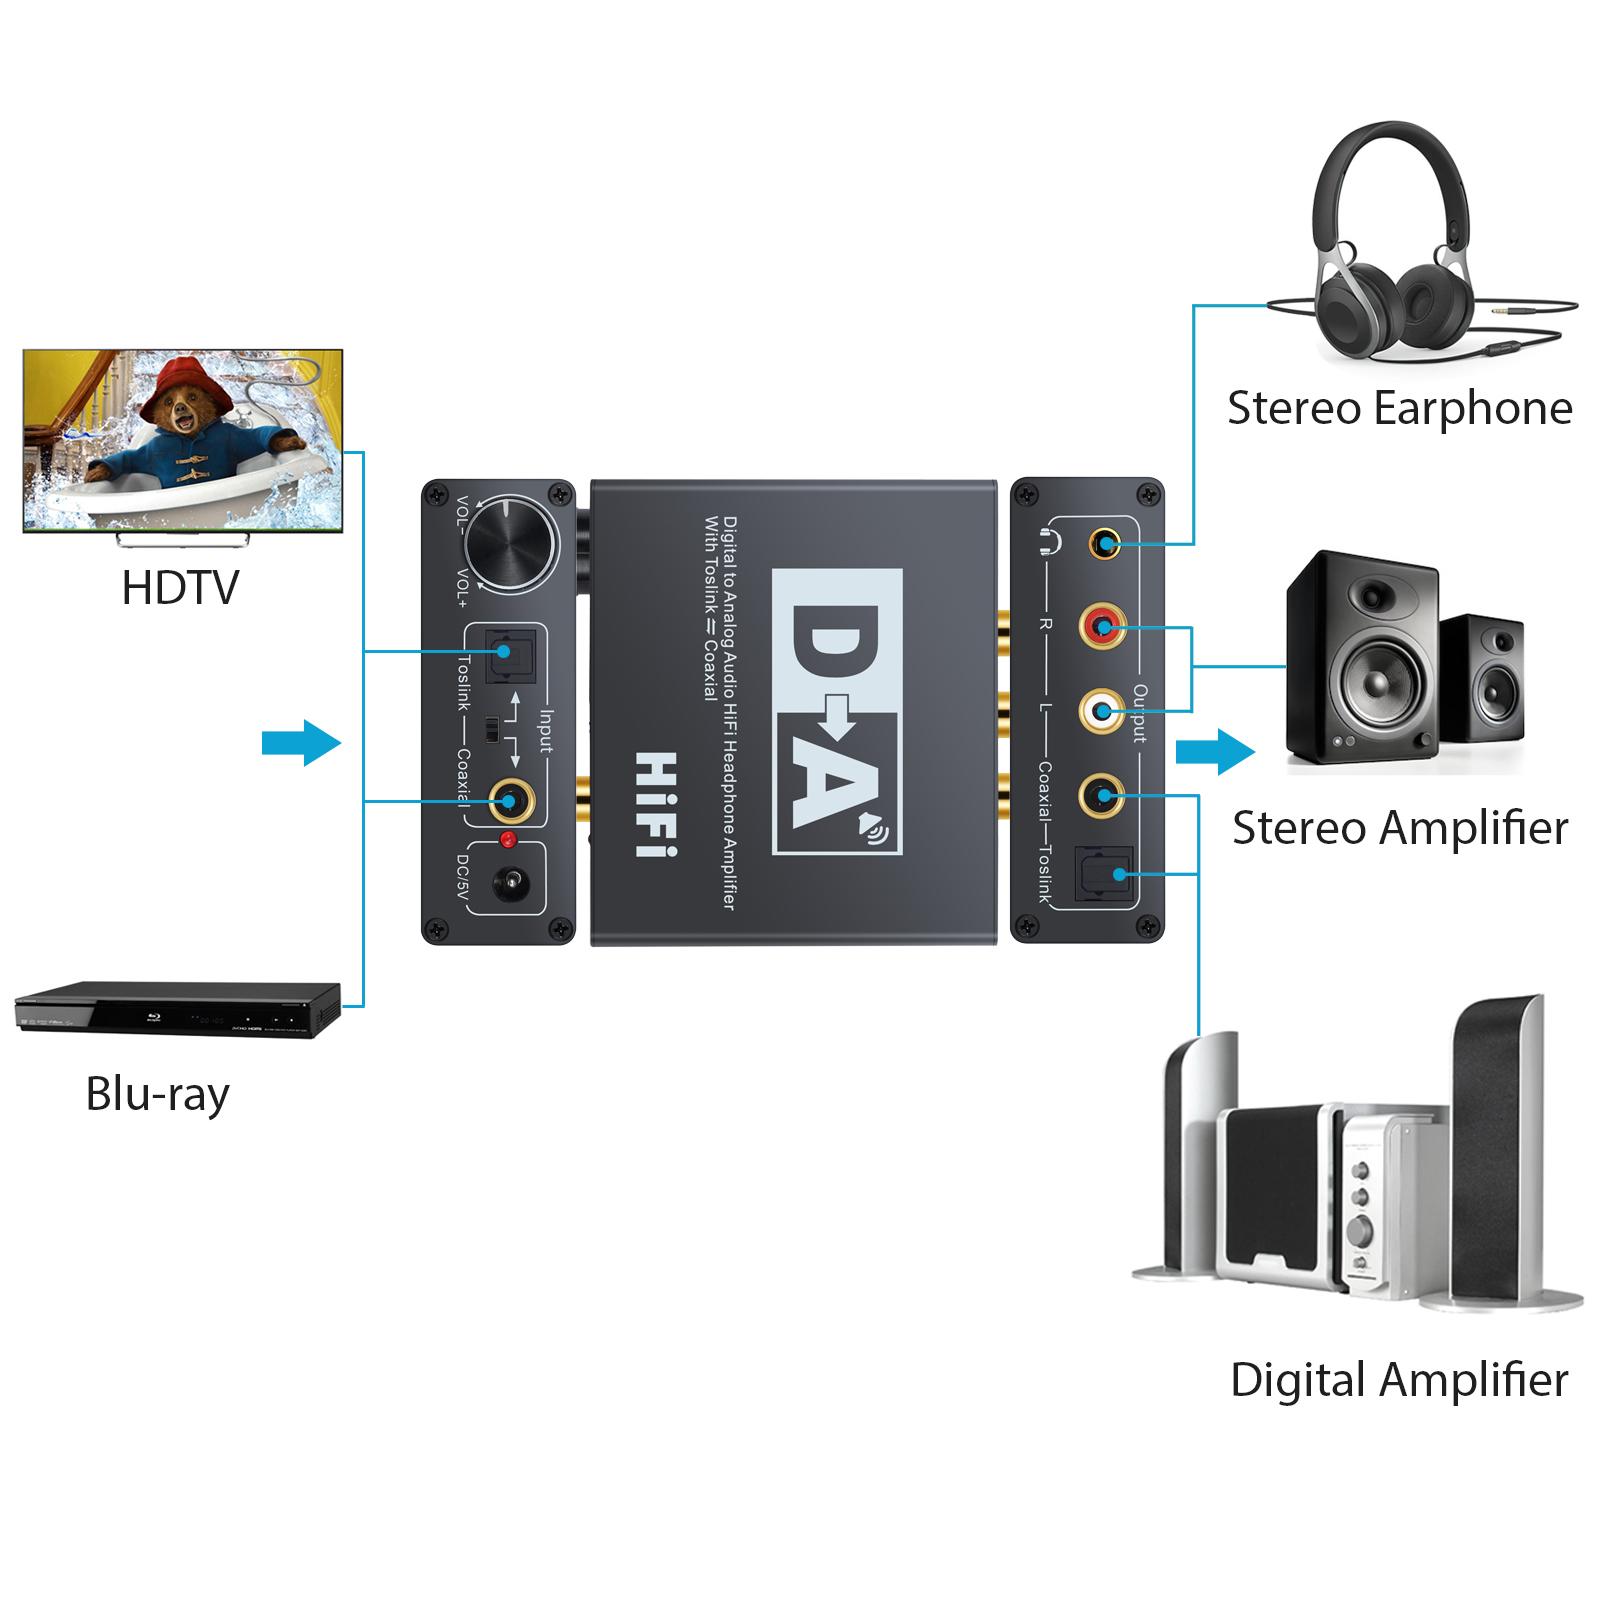 Details about 192kHz Digital Coaxial Toslink to Analog L/R Aduio Converter  PCM/LPCM Format TV